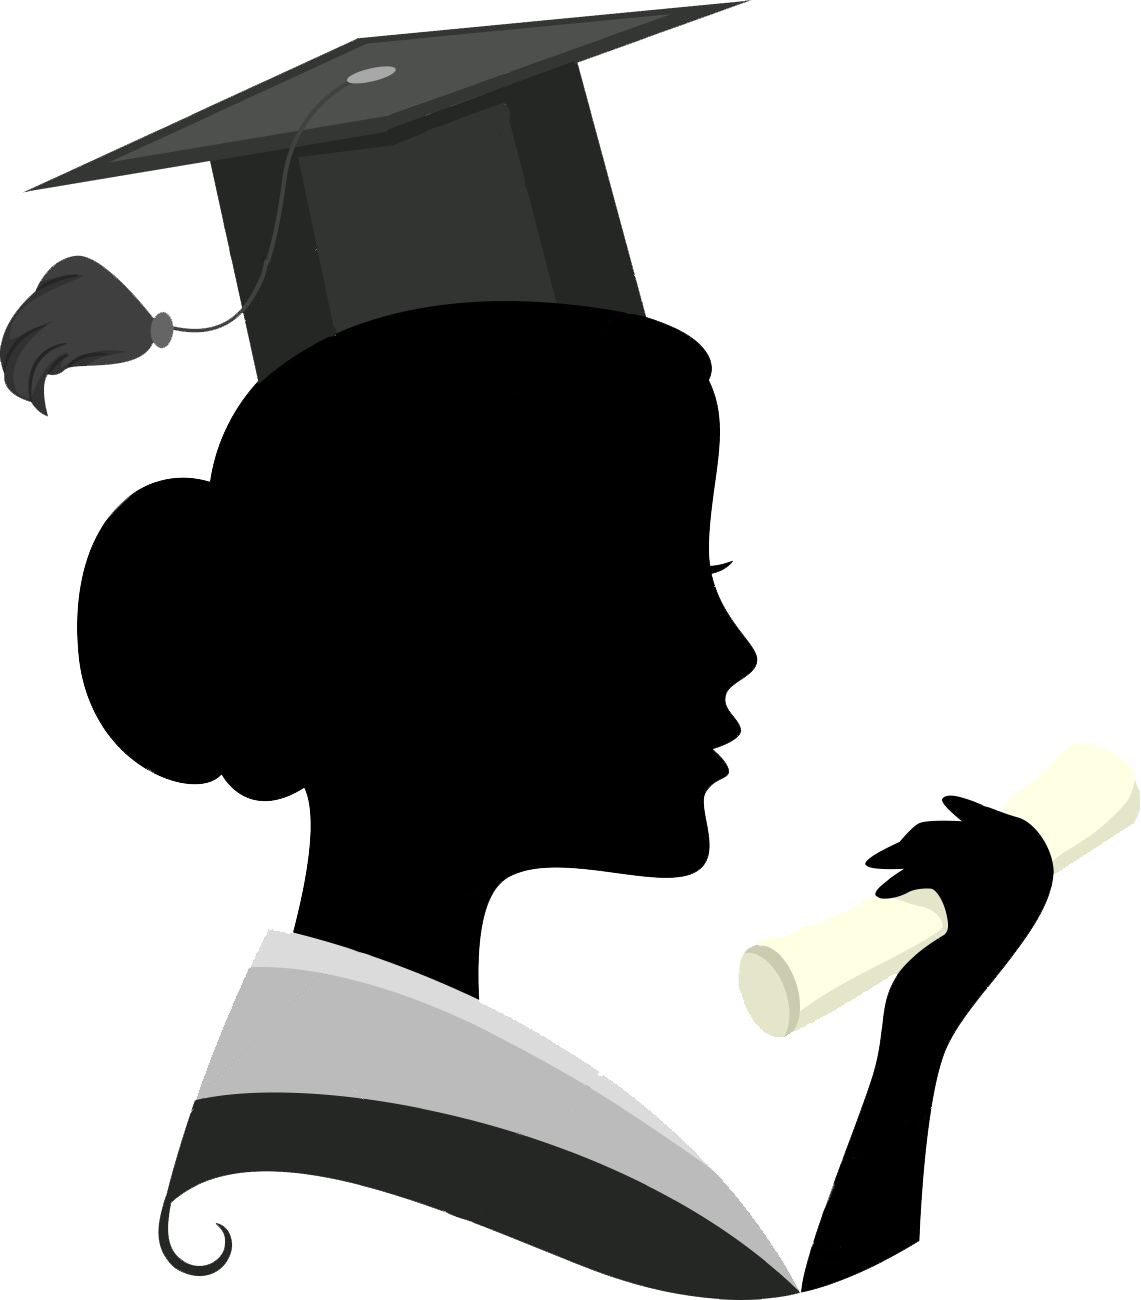 Graduate uniform